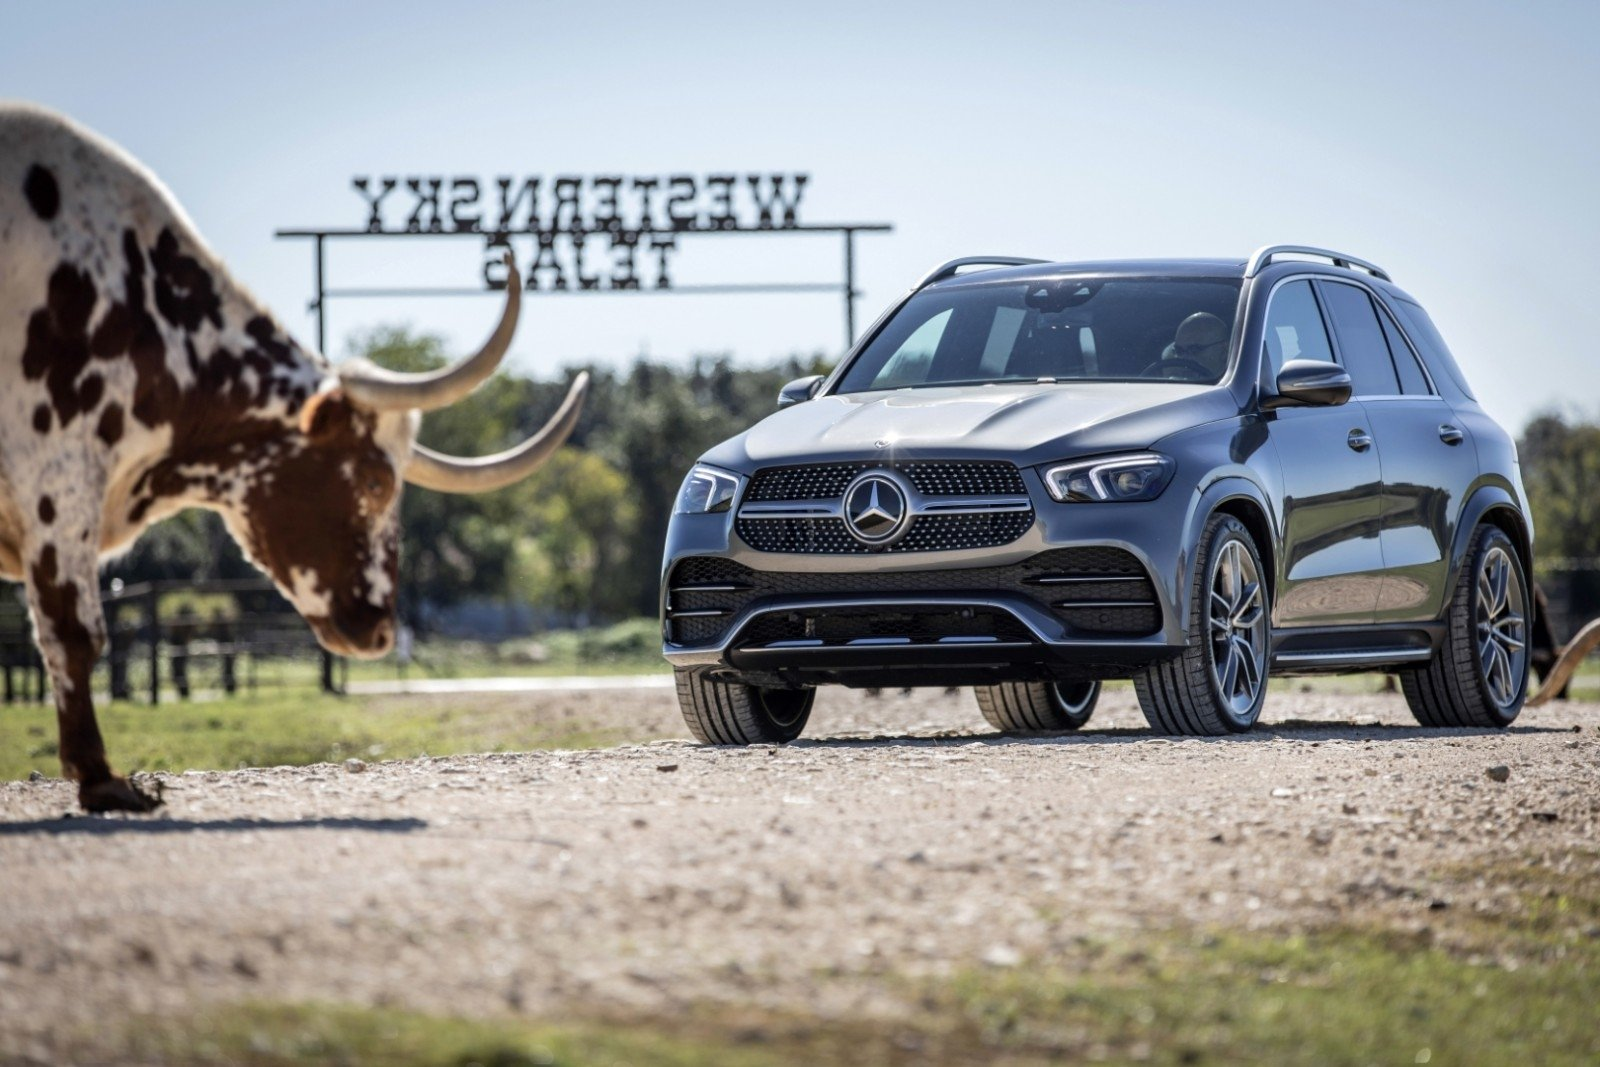 Mercedes Livestock Show 2020.Mercedes Benz Pasigyrė Naujajame Gle Dar Nenaudotos